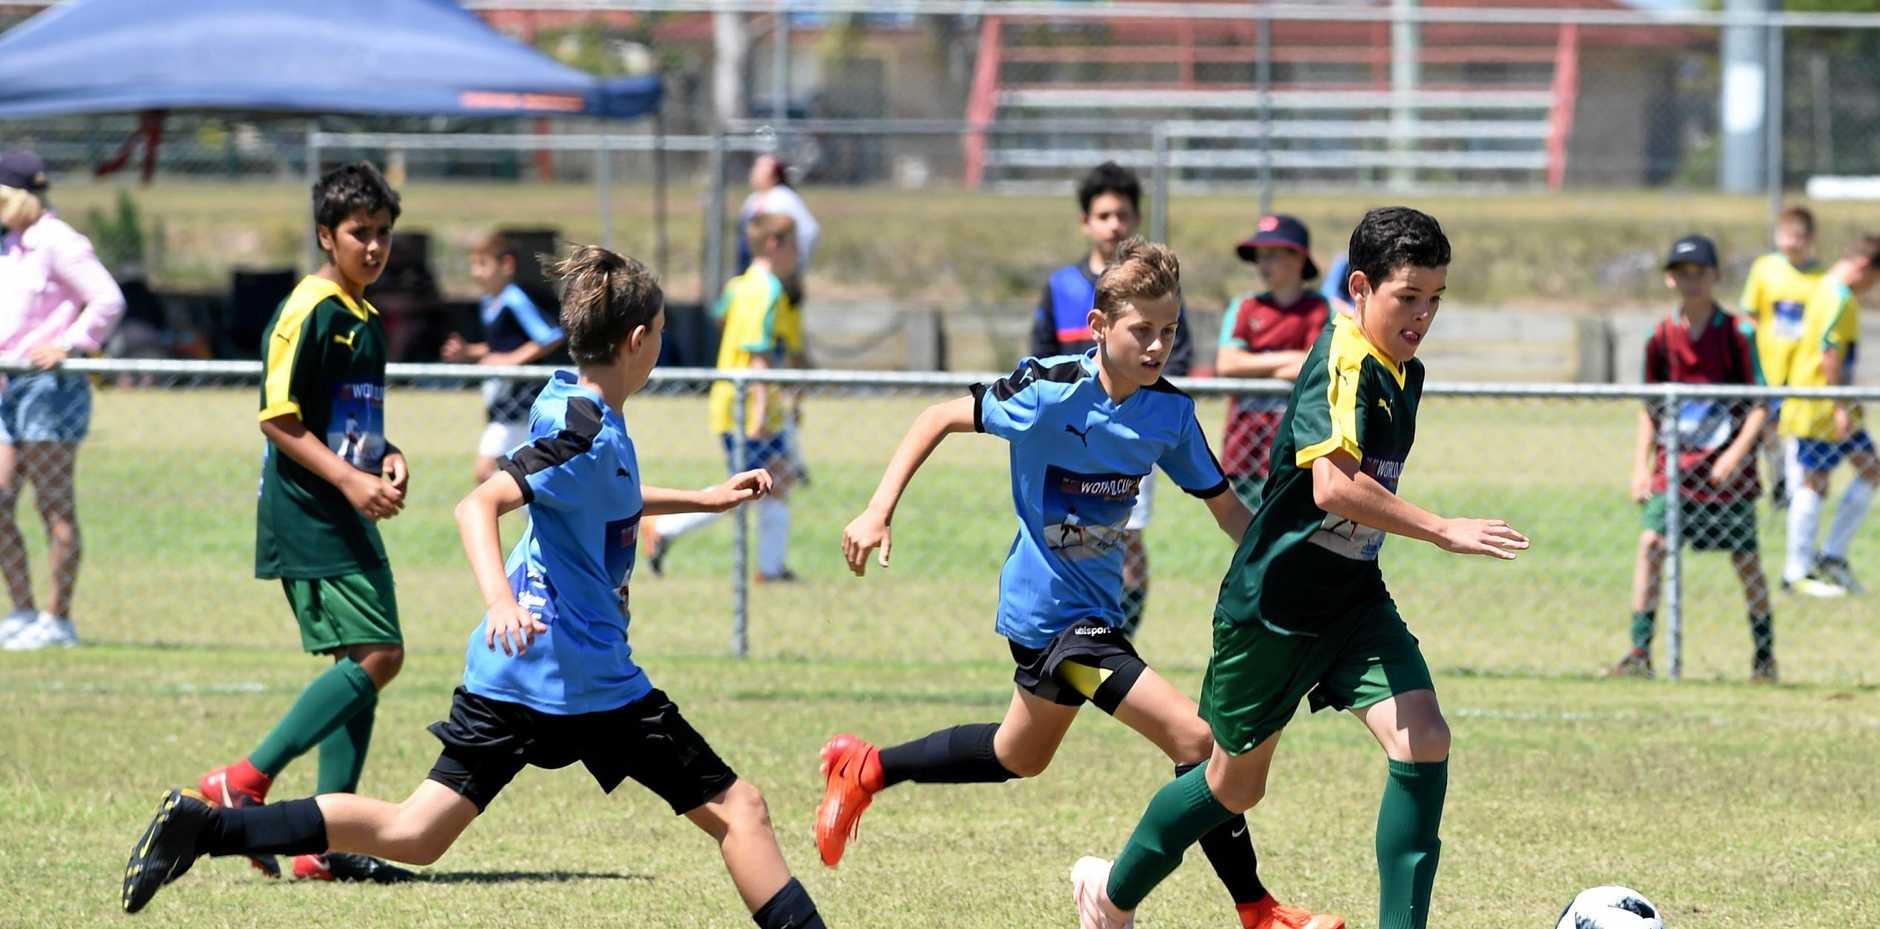 WORLD GAME: Australia (Toowoomba Gold) v Uruguay (Buccaneers) at the 2018 Joeys Mini World Cup at Hervey Bay.